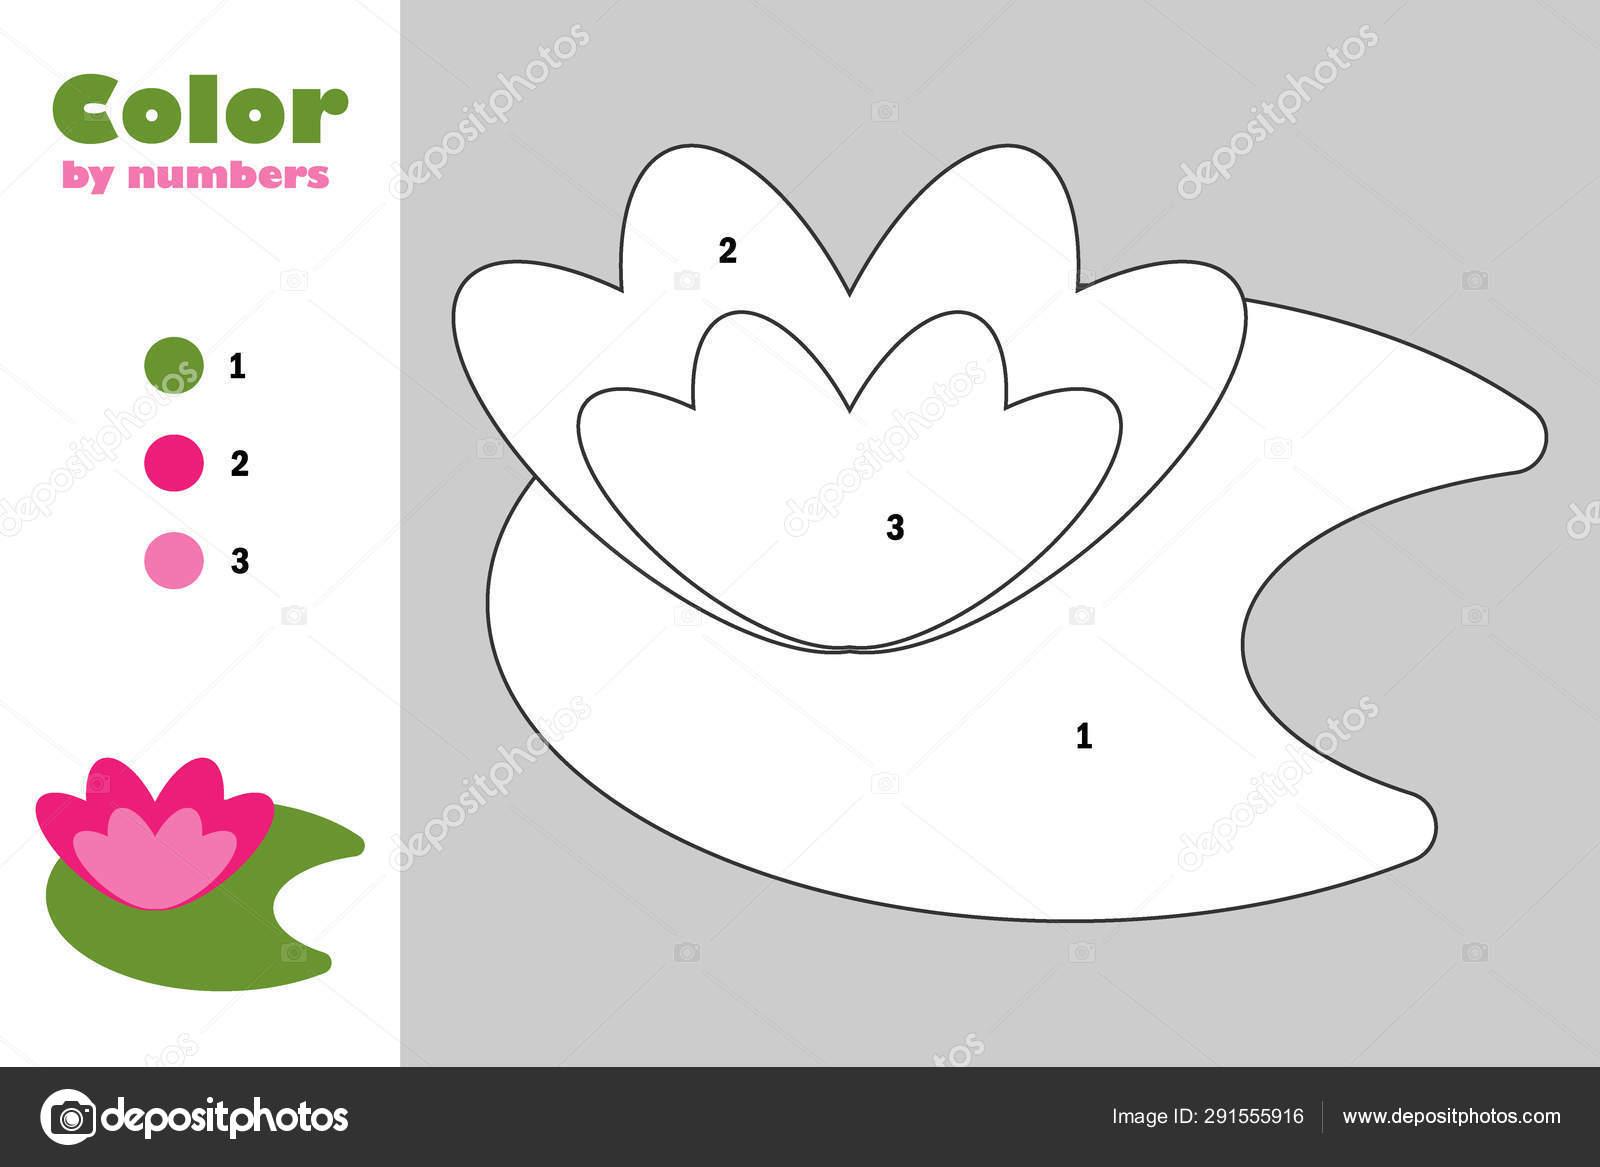 Printable water cycle worksheets for preschools | 1167x1600